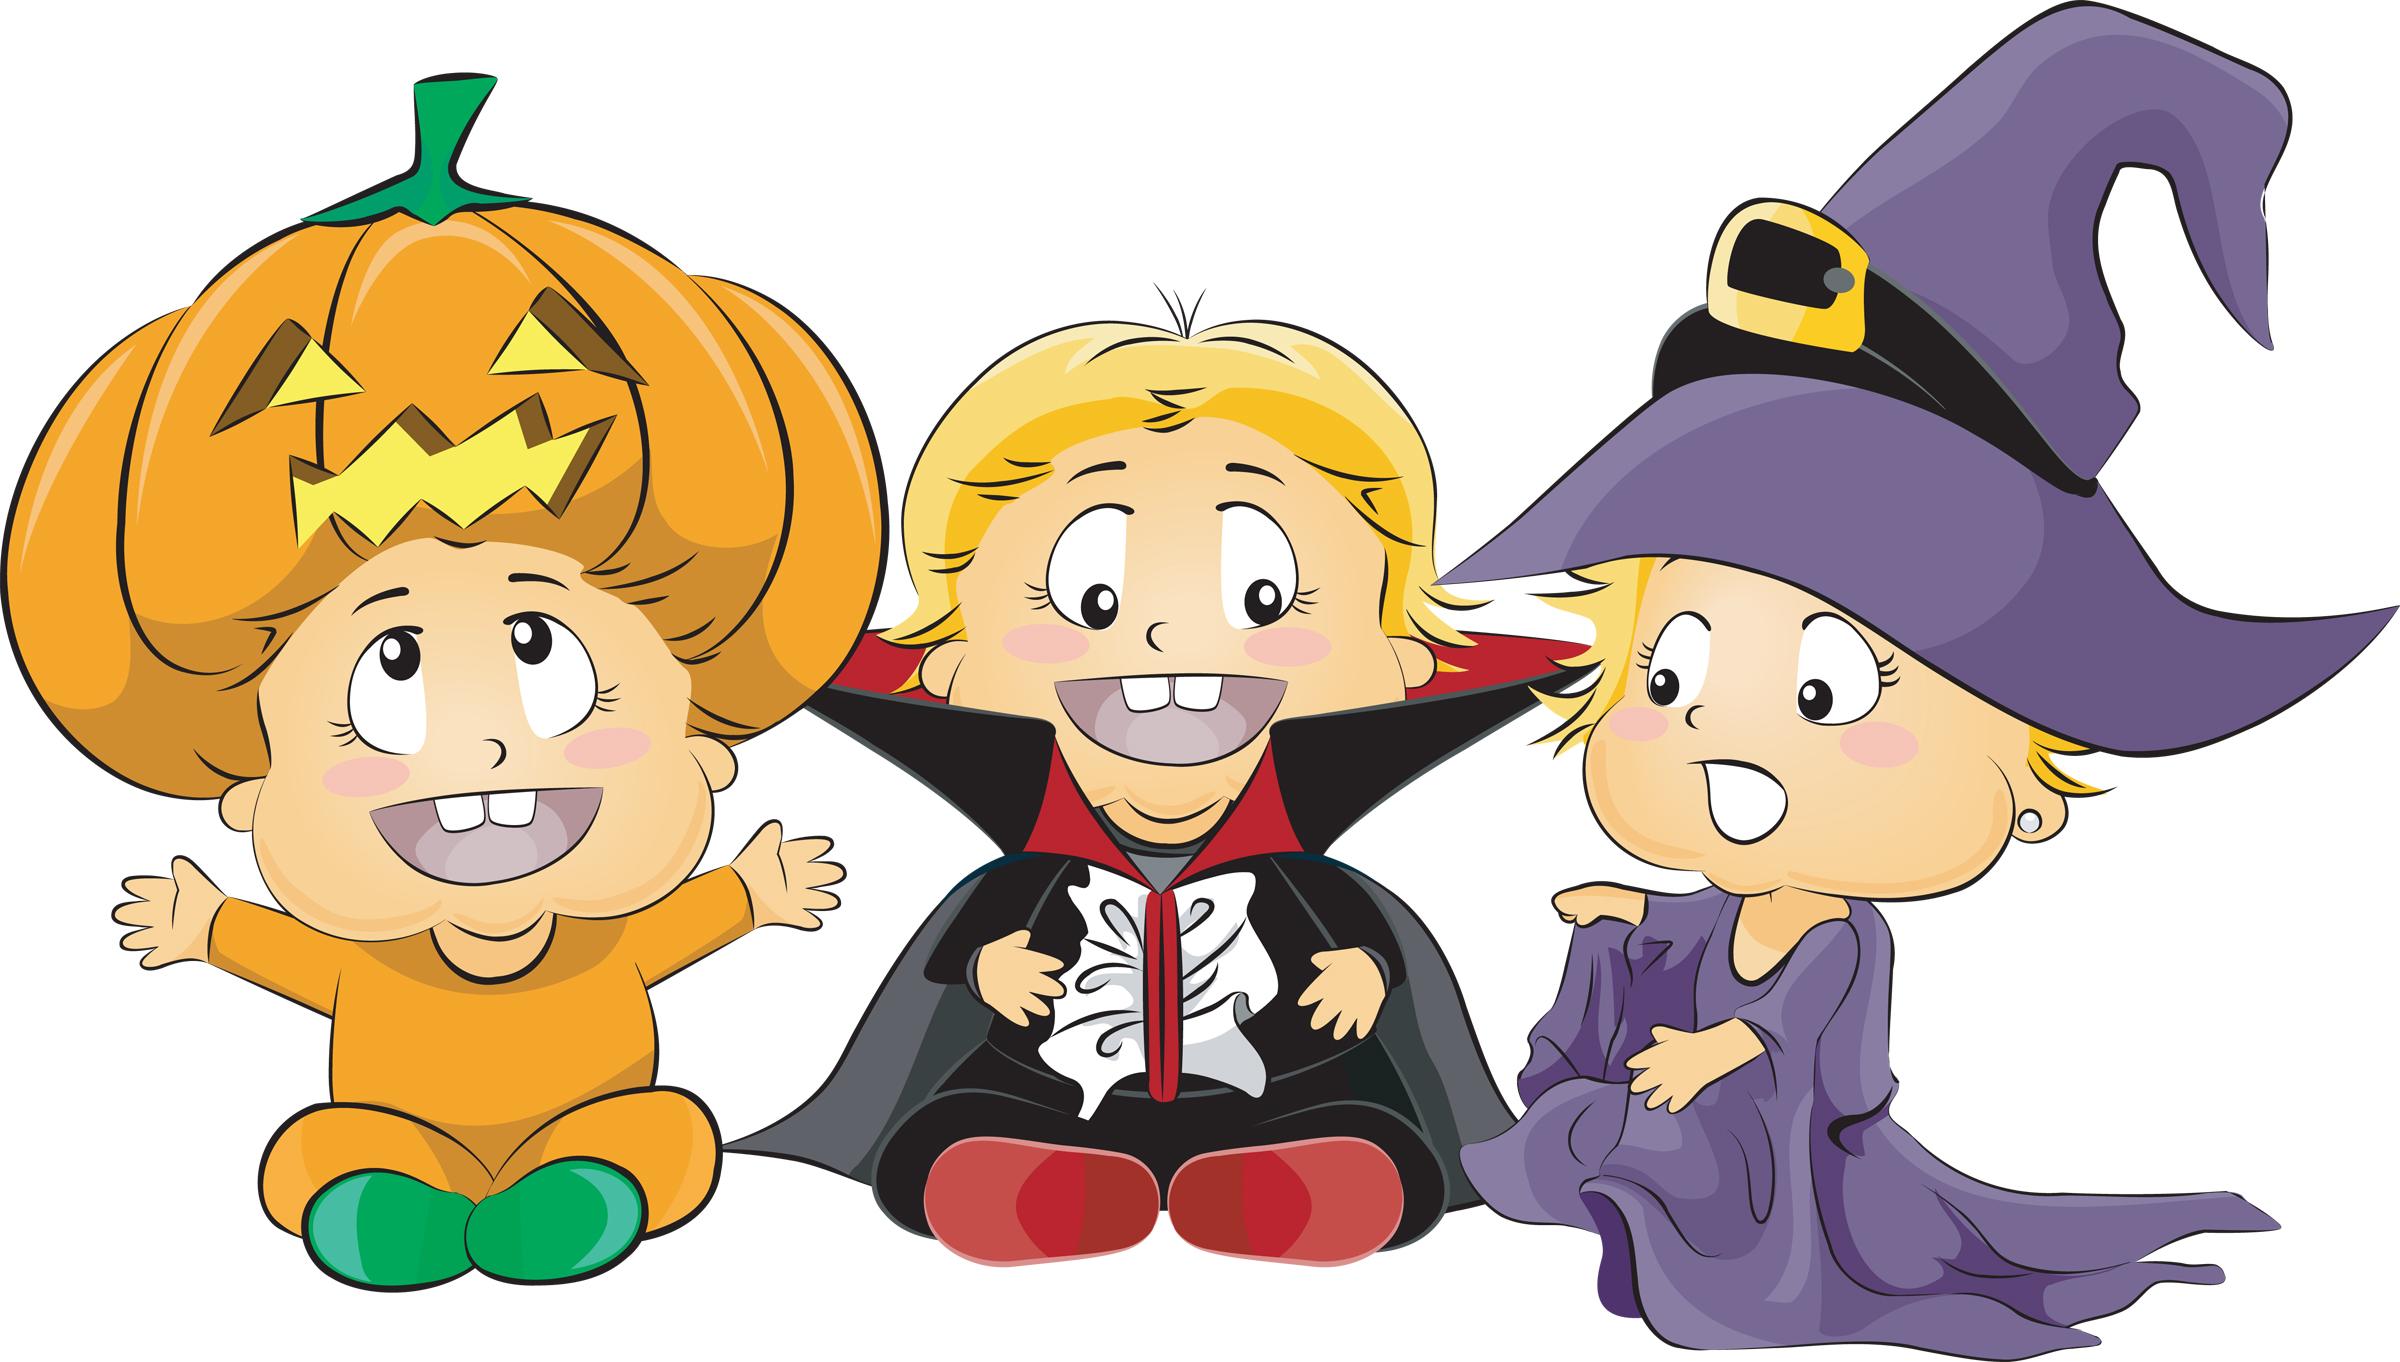 halloween carnivals in alameda in october 2013 purim clipart free purim clip art images transparent